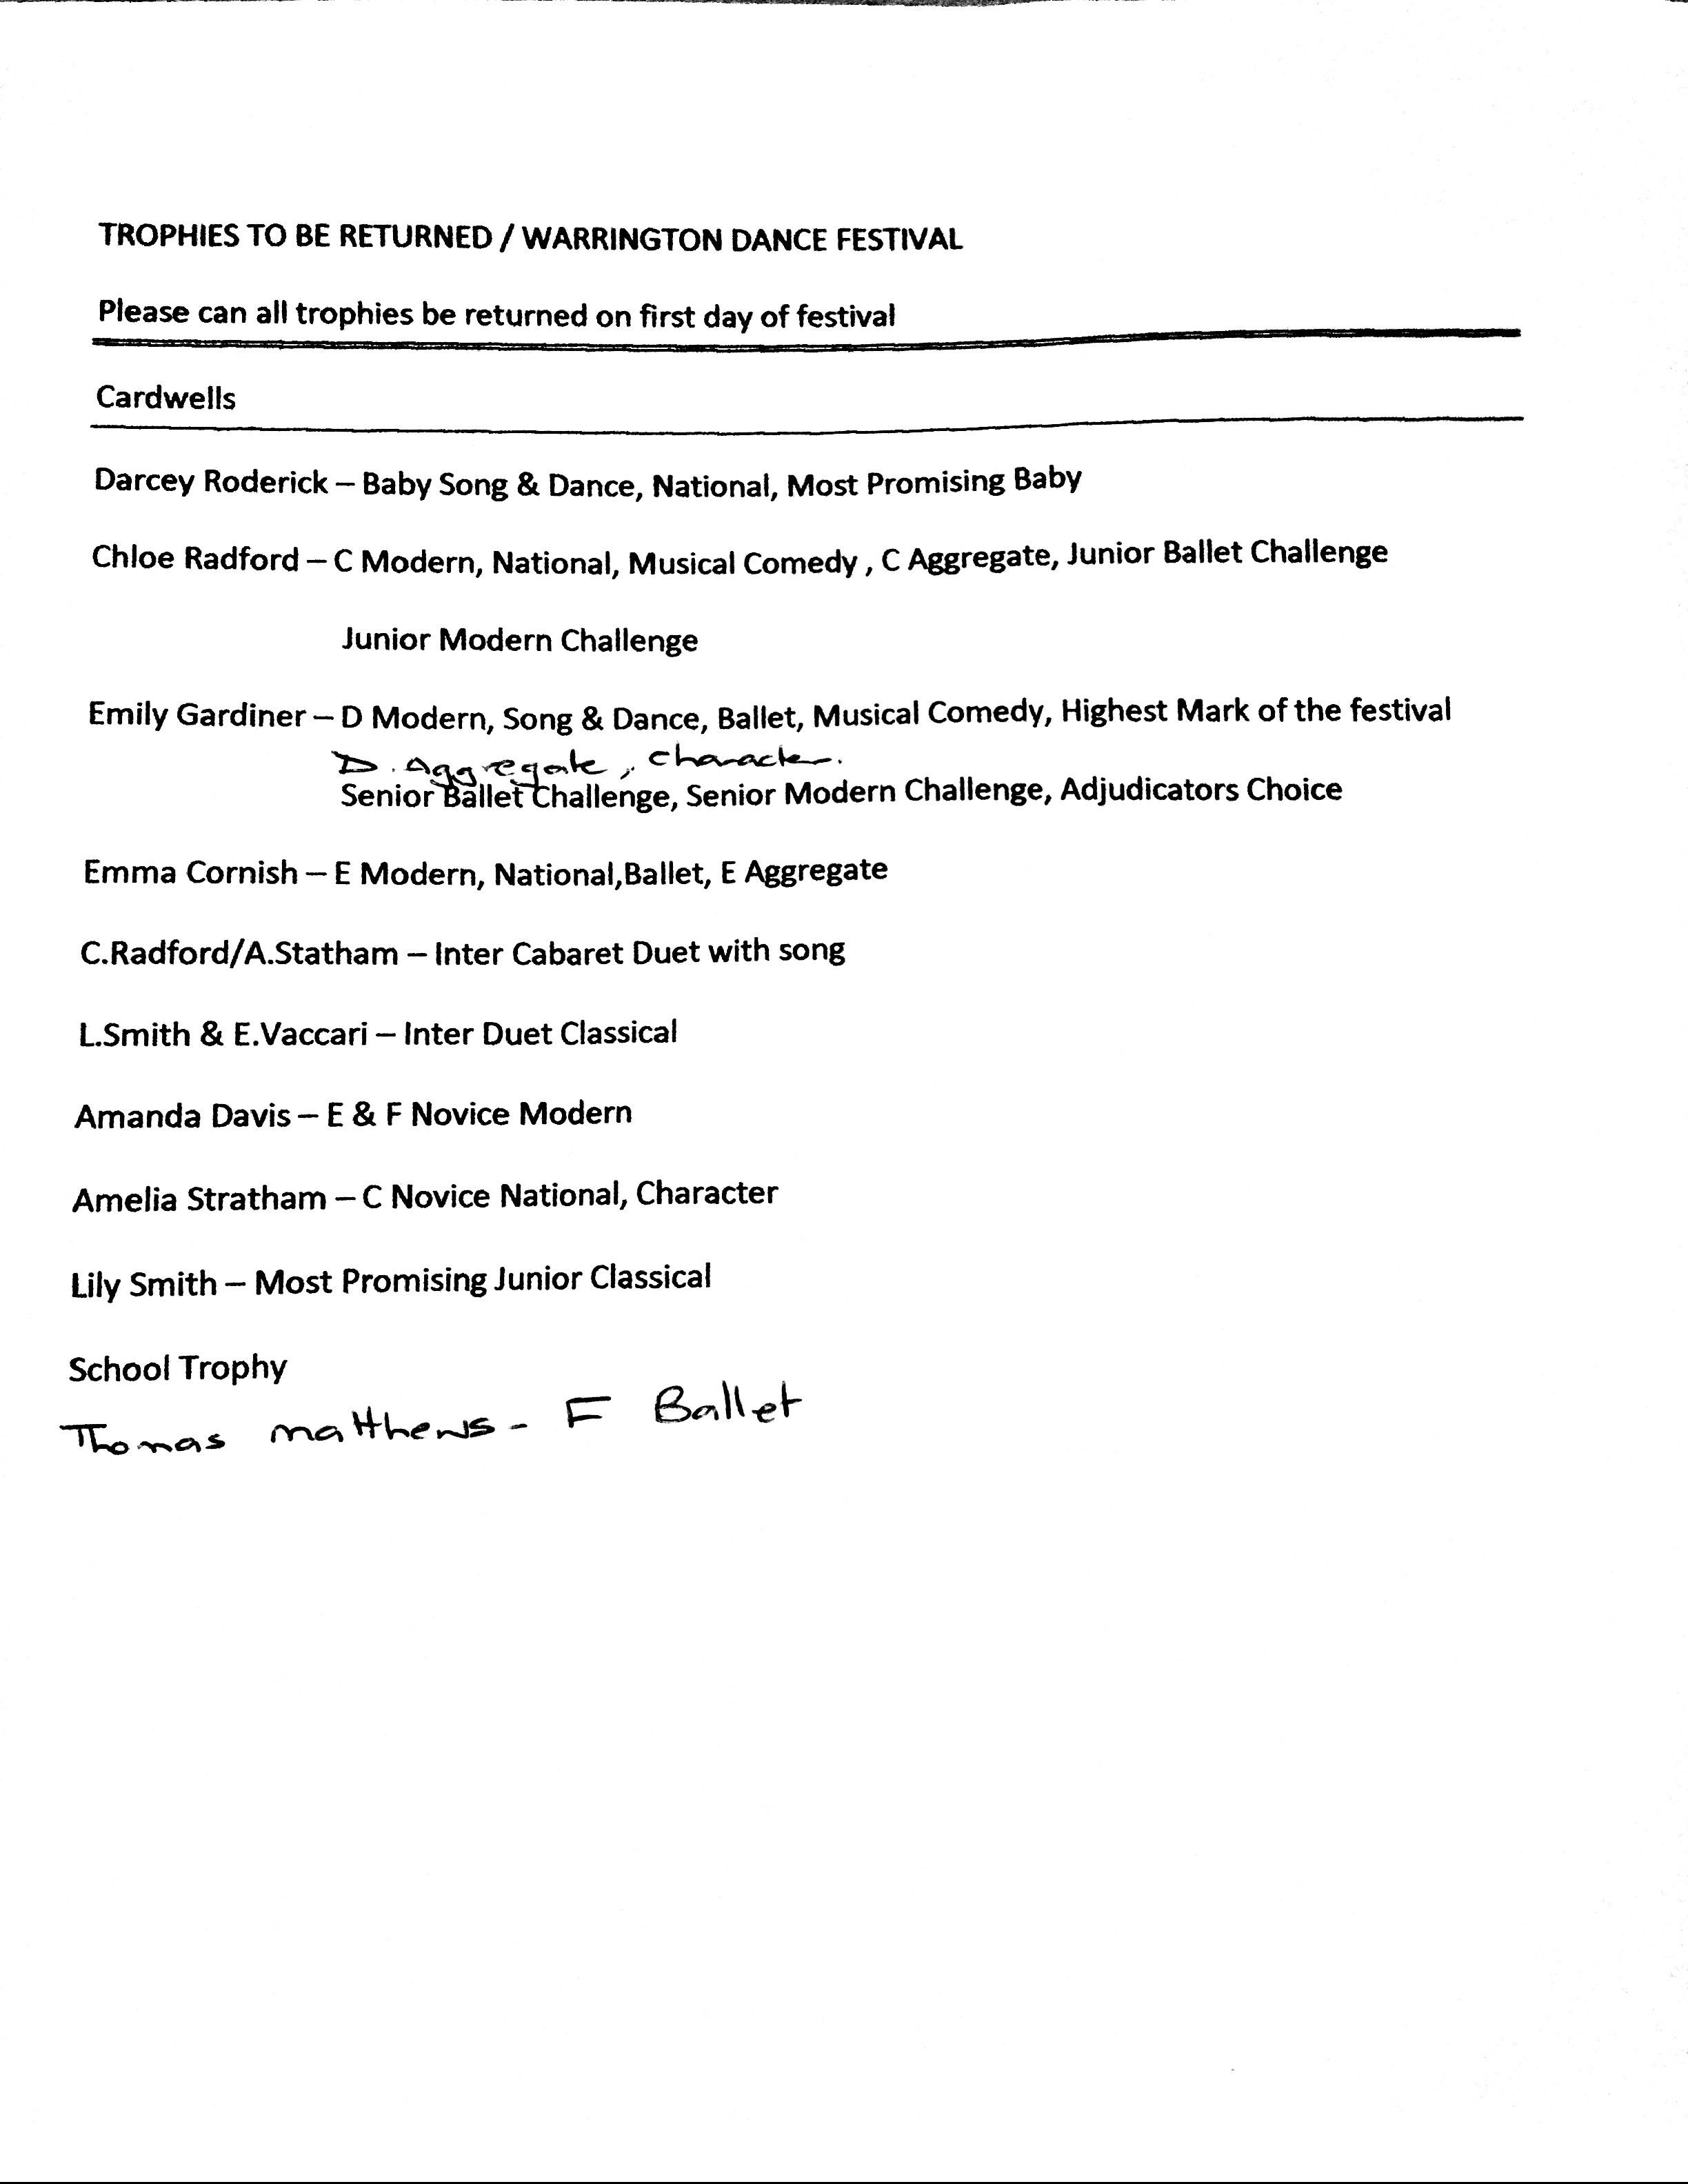 Trophy List